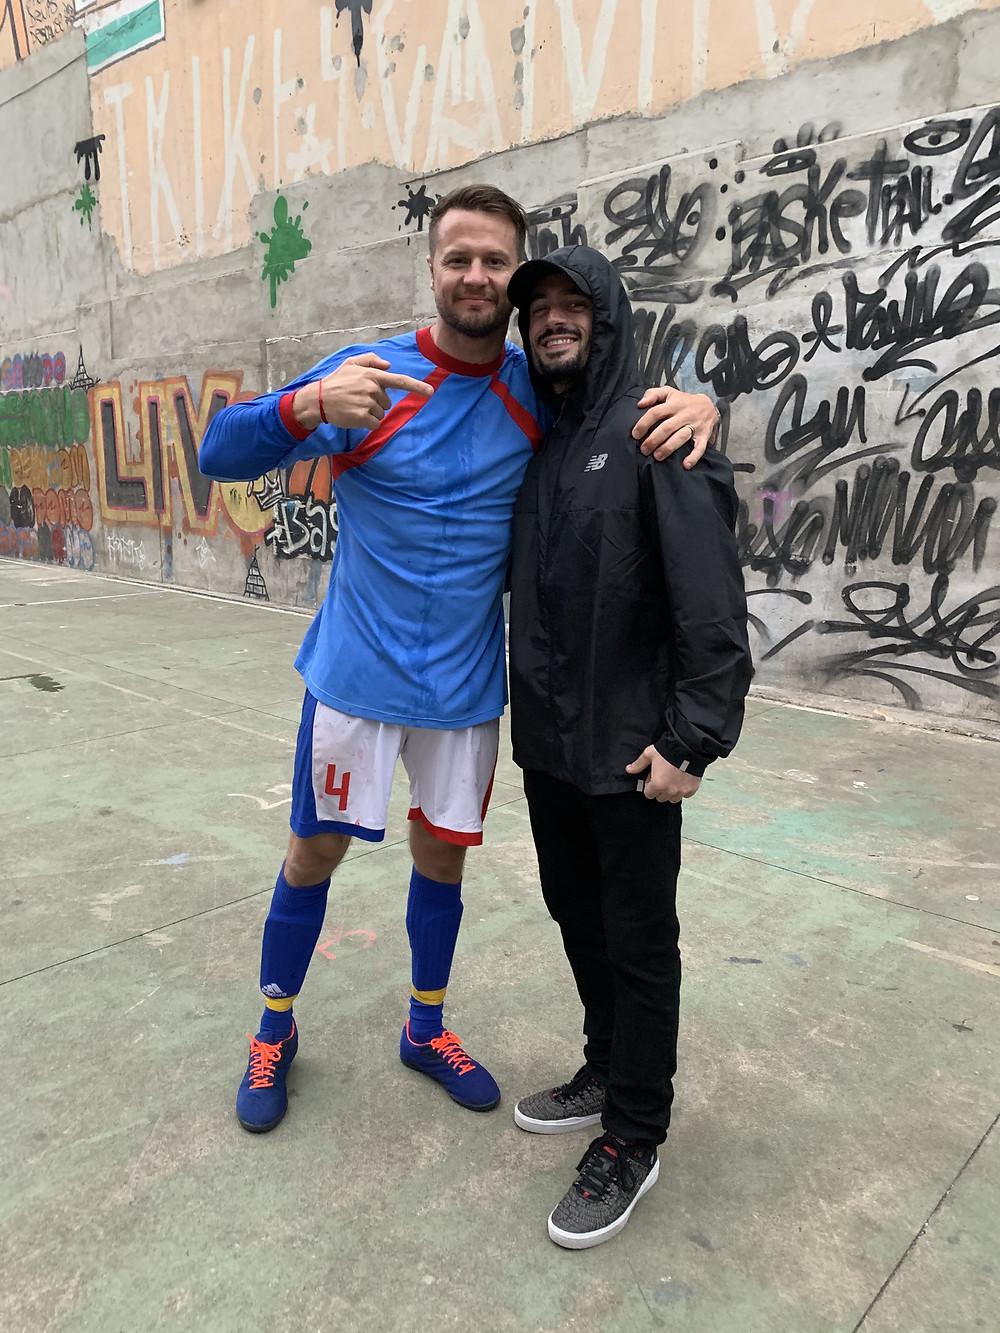 Brad R Lambert with client Bobby Holland Hanton in São Paulo